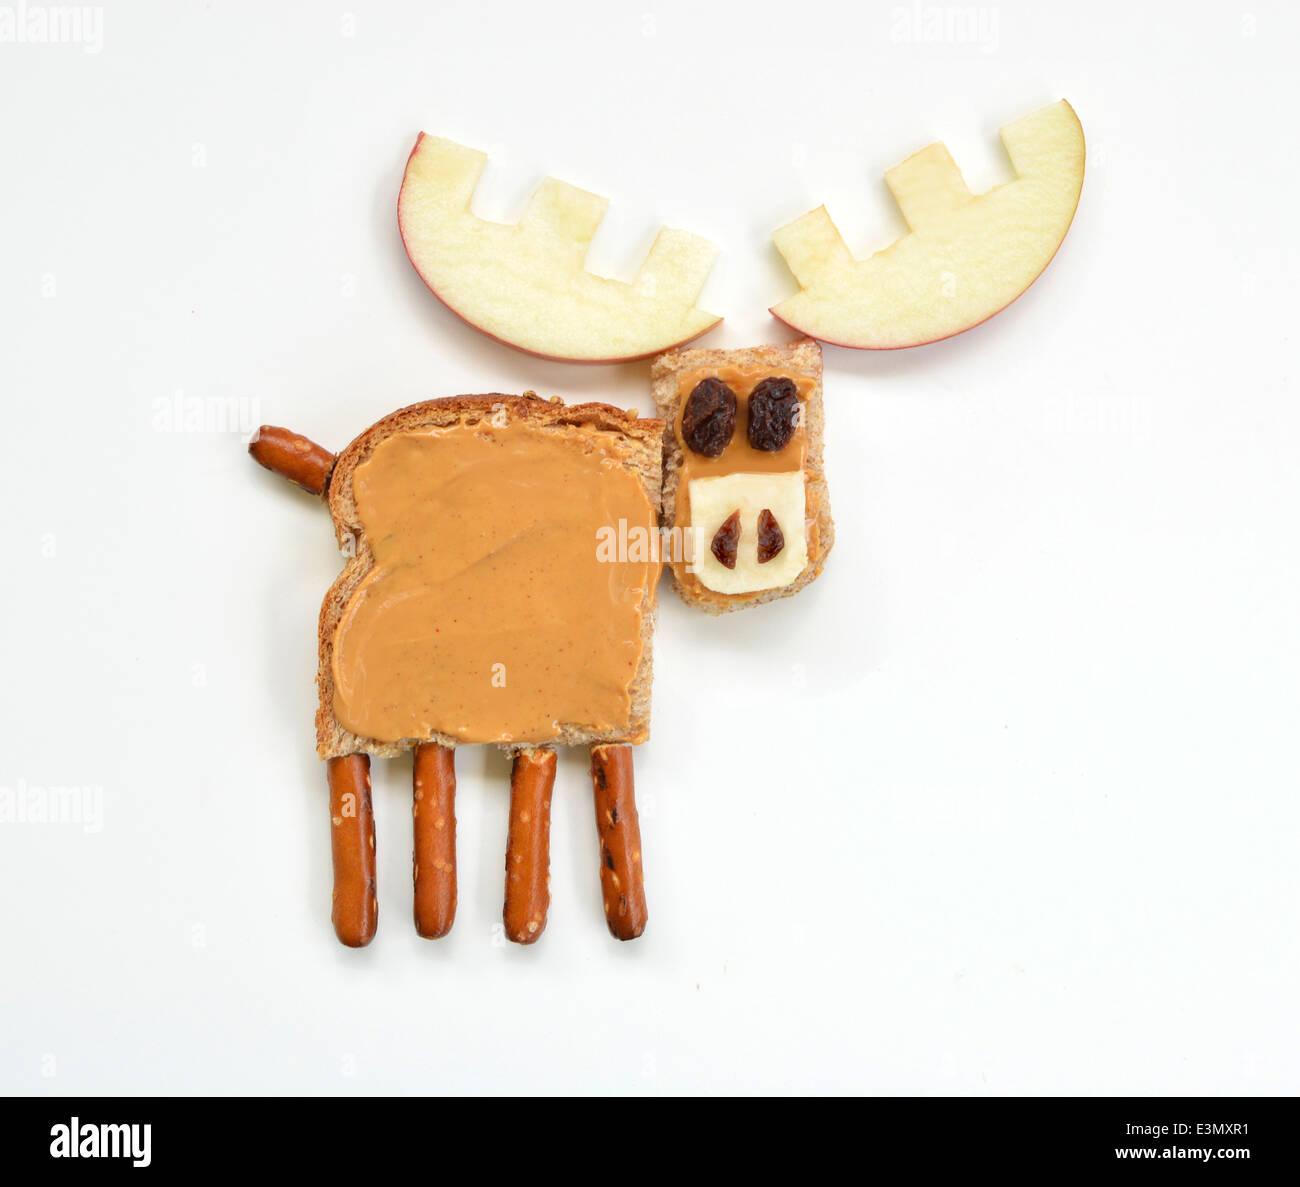 Arte comida de alces Imagen De Stock